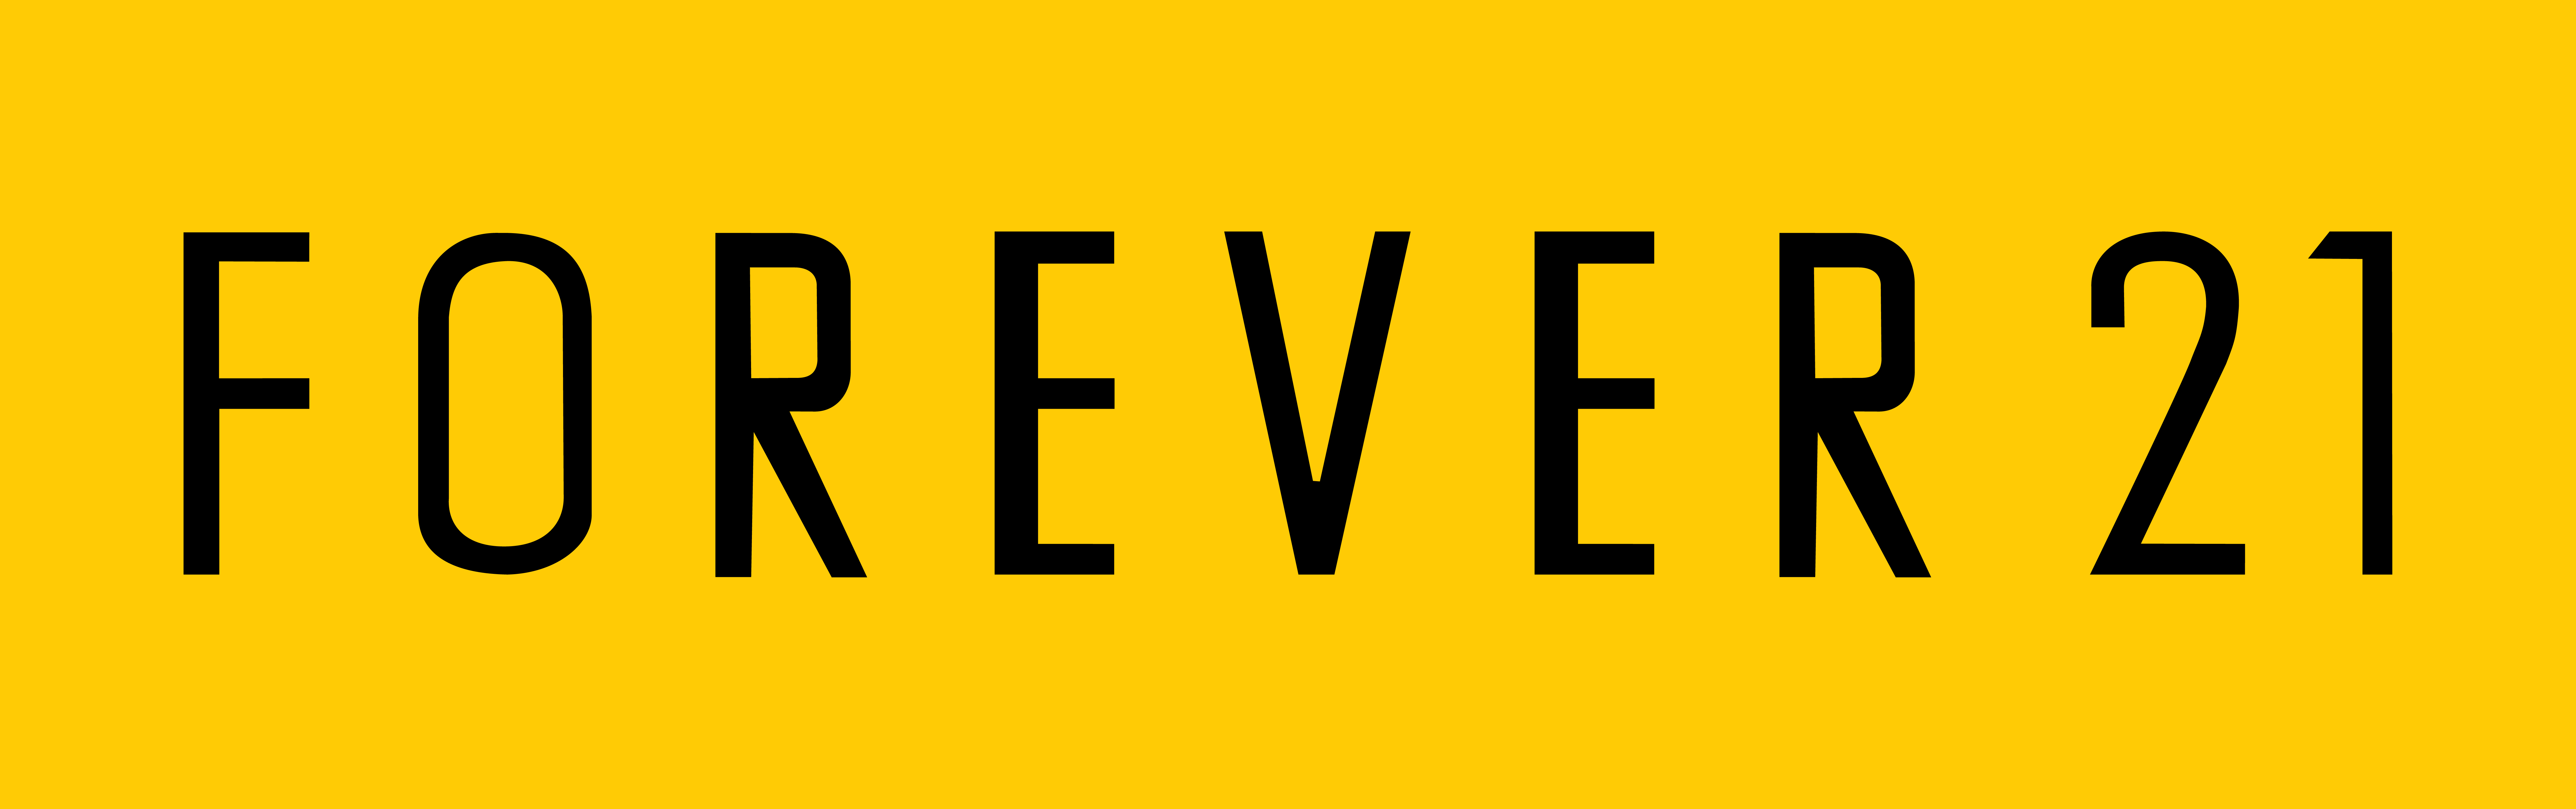 Forever 21 Logo PNG-PlusPNG.com-9000 - Forever 21 Logo PNG